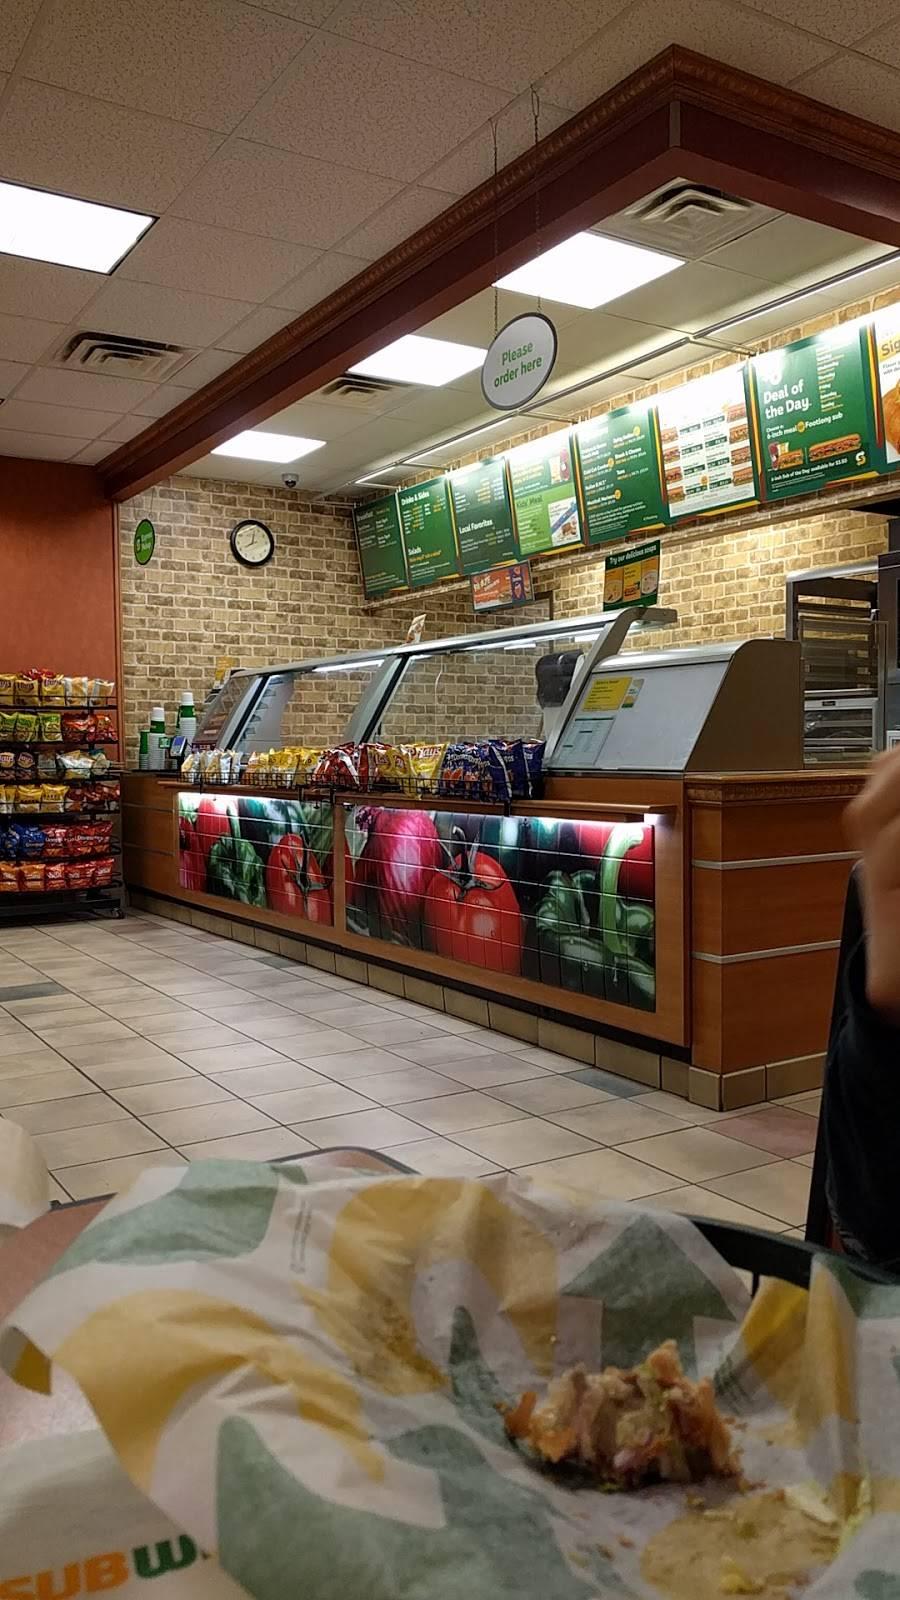 Subway   restaurant   9978 Spotswood Trail, McGaheysville, VA 22840, USA   5402895110 OR +1 540-289-5110